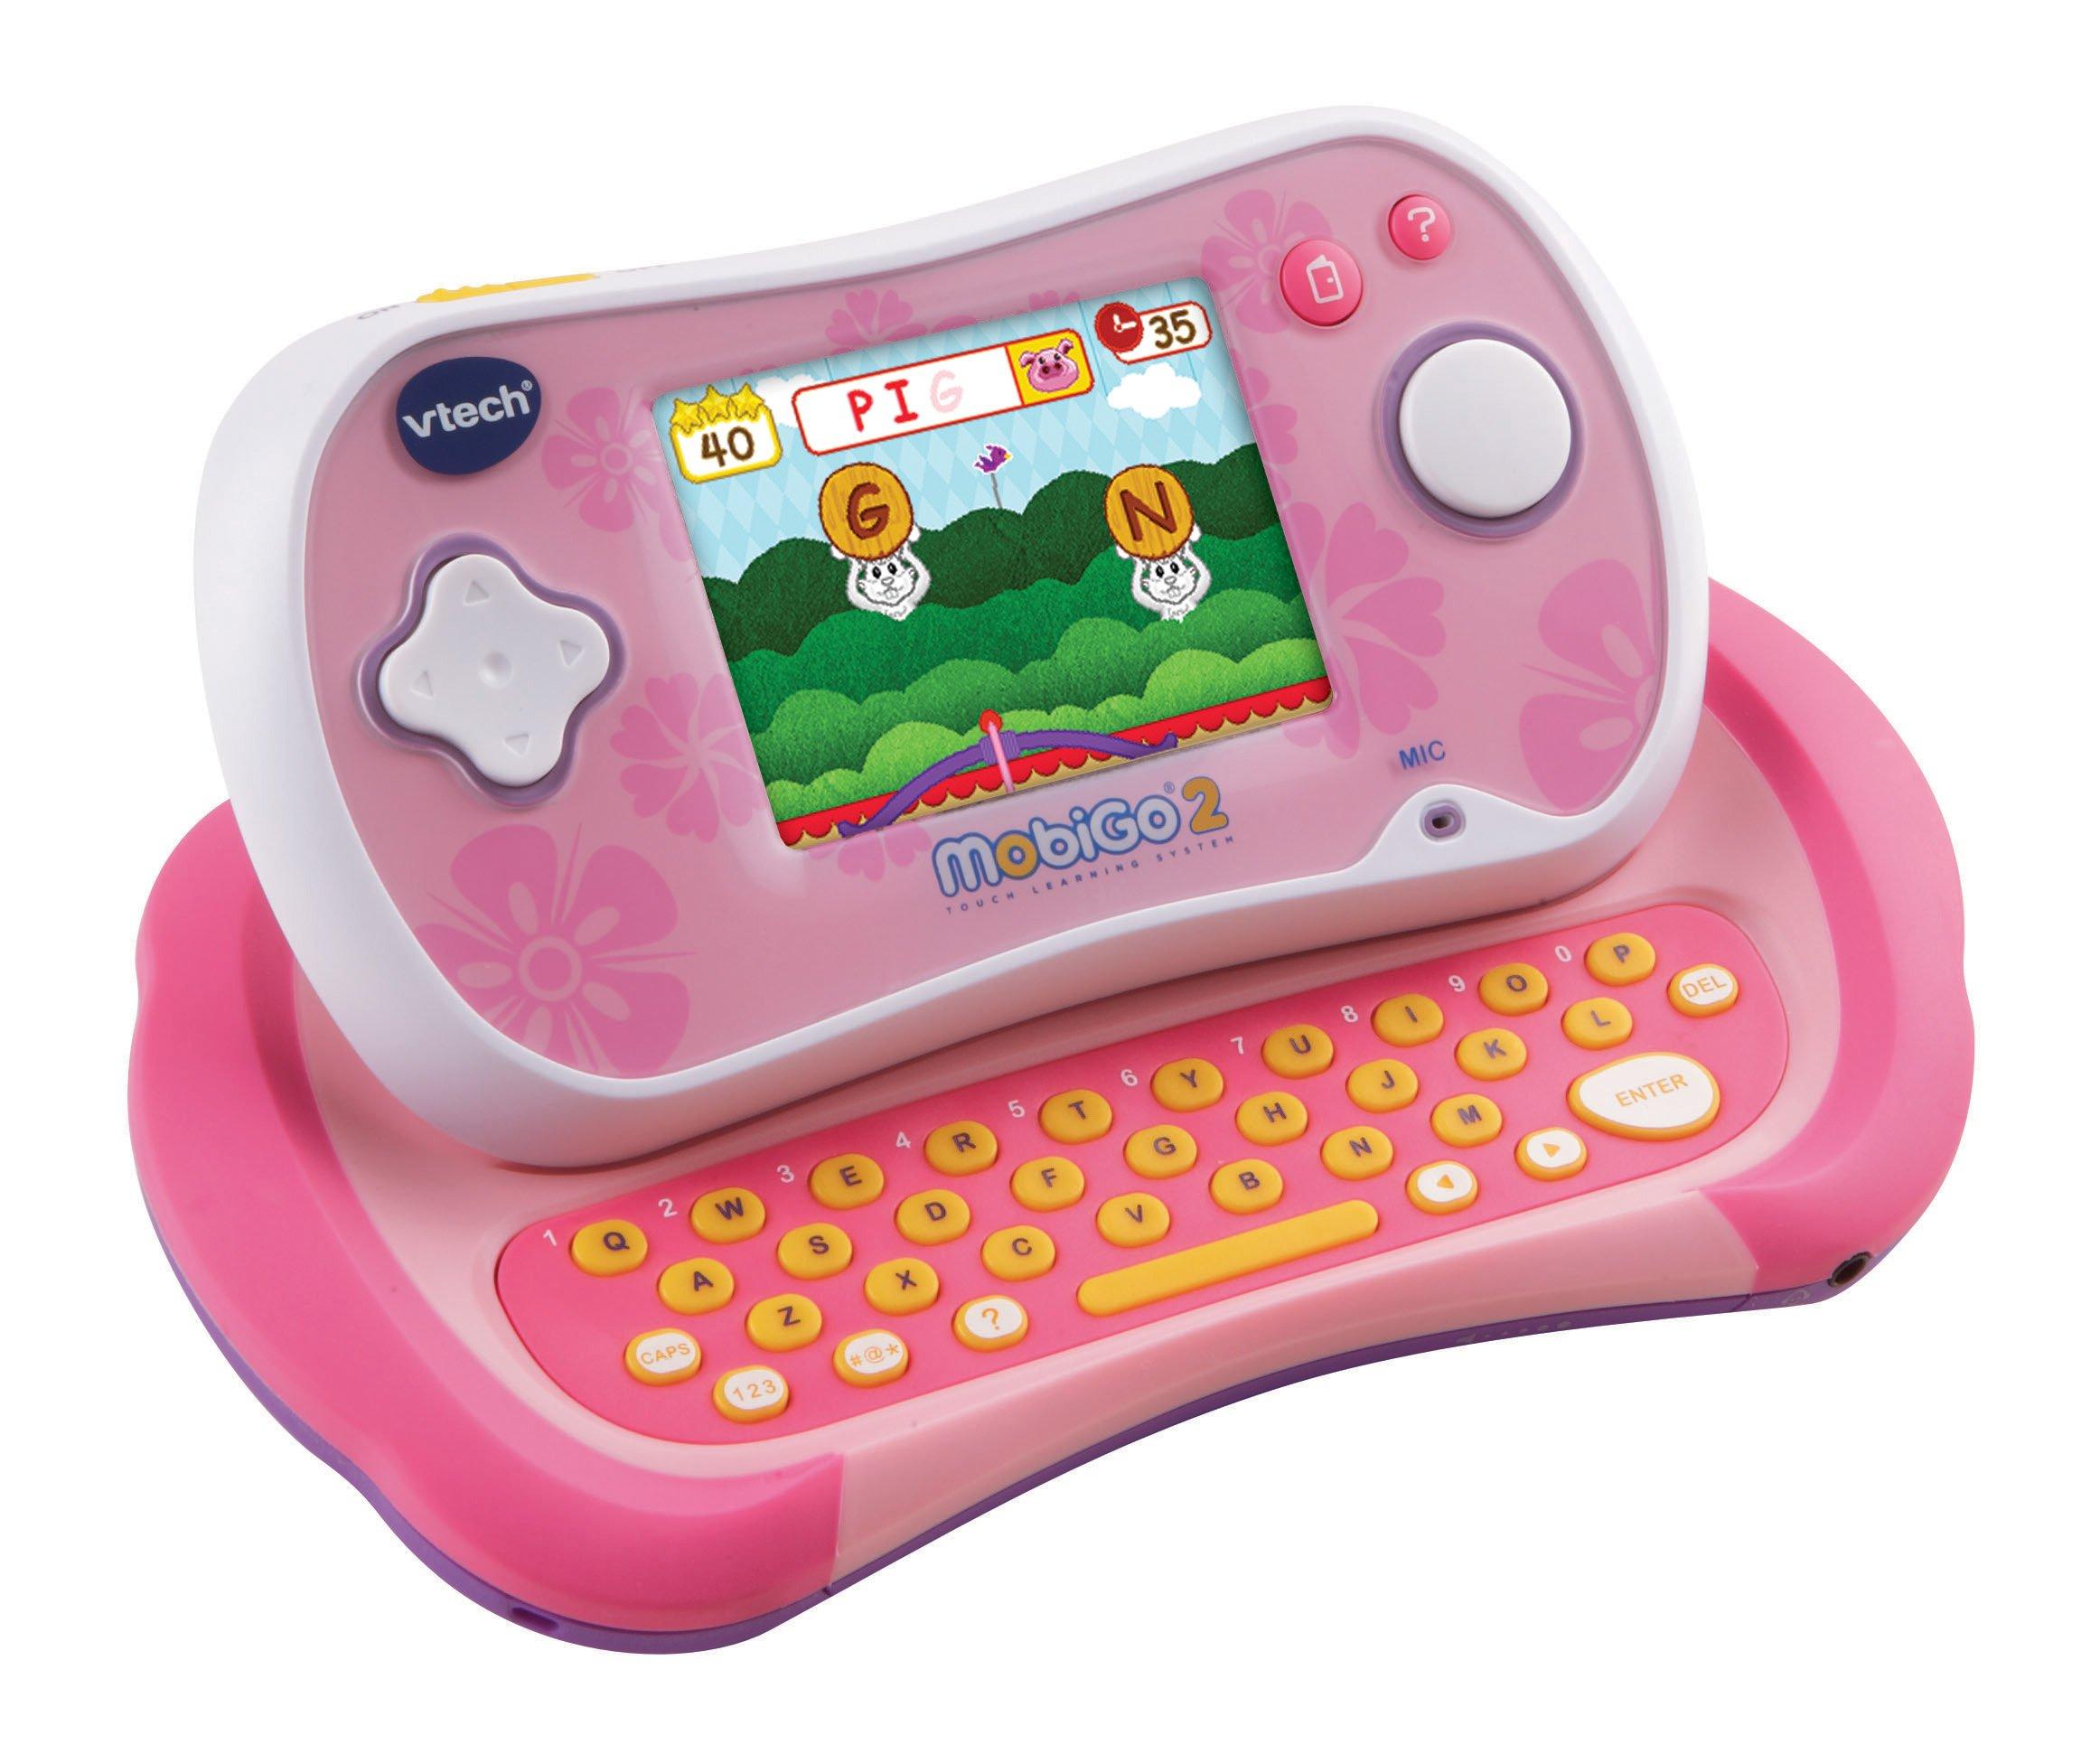 VTech MobiGo 2 Touch Learning System - Pink by VTech (Image #2)